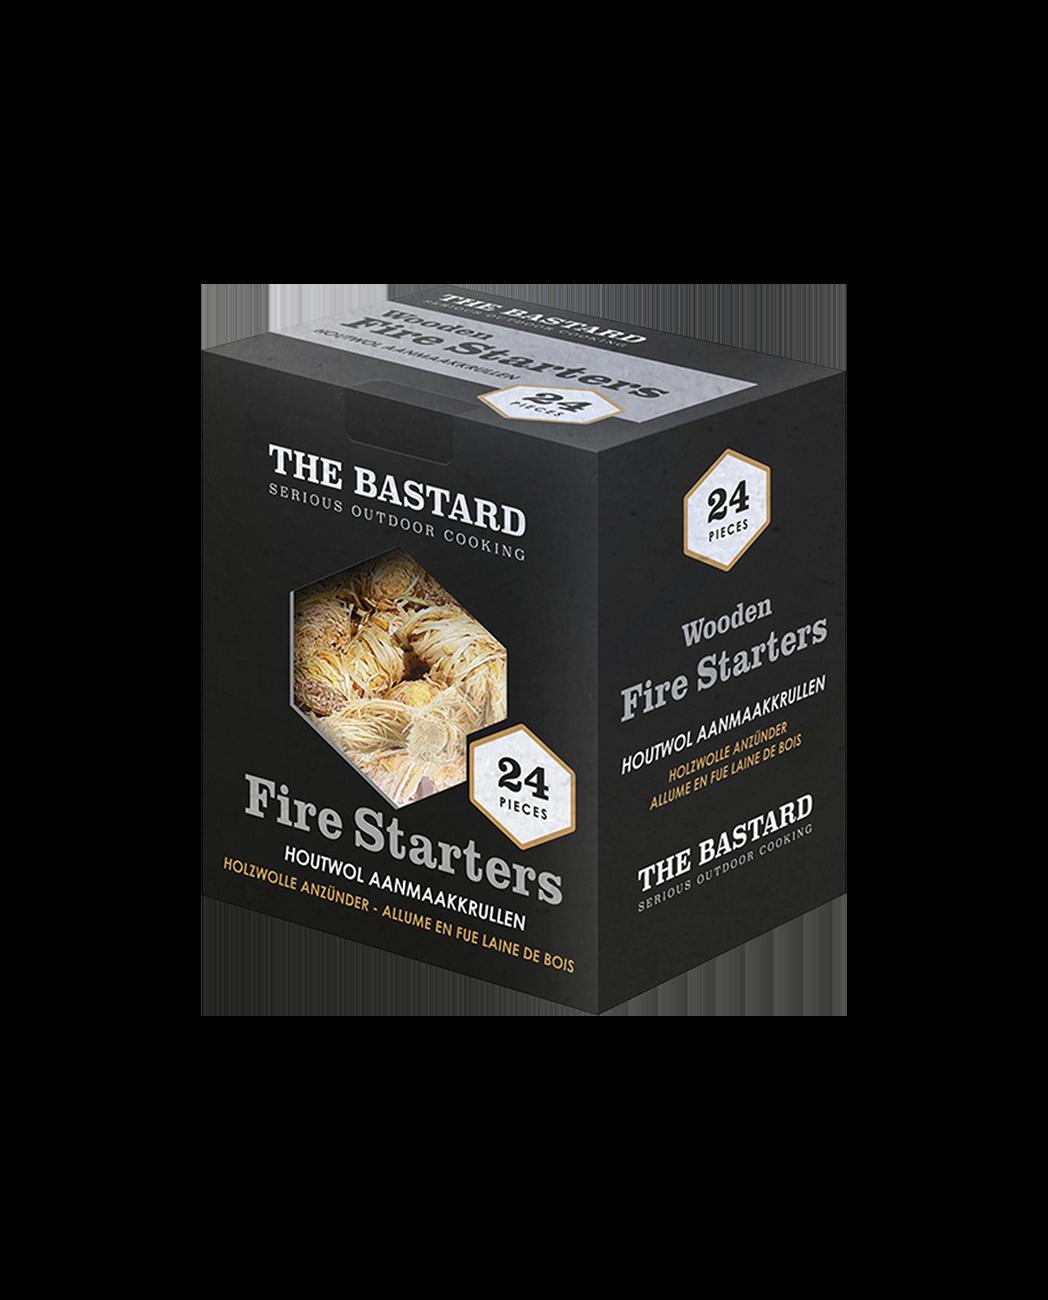 The Bastard | Fire Starters | Rookplankje.nl